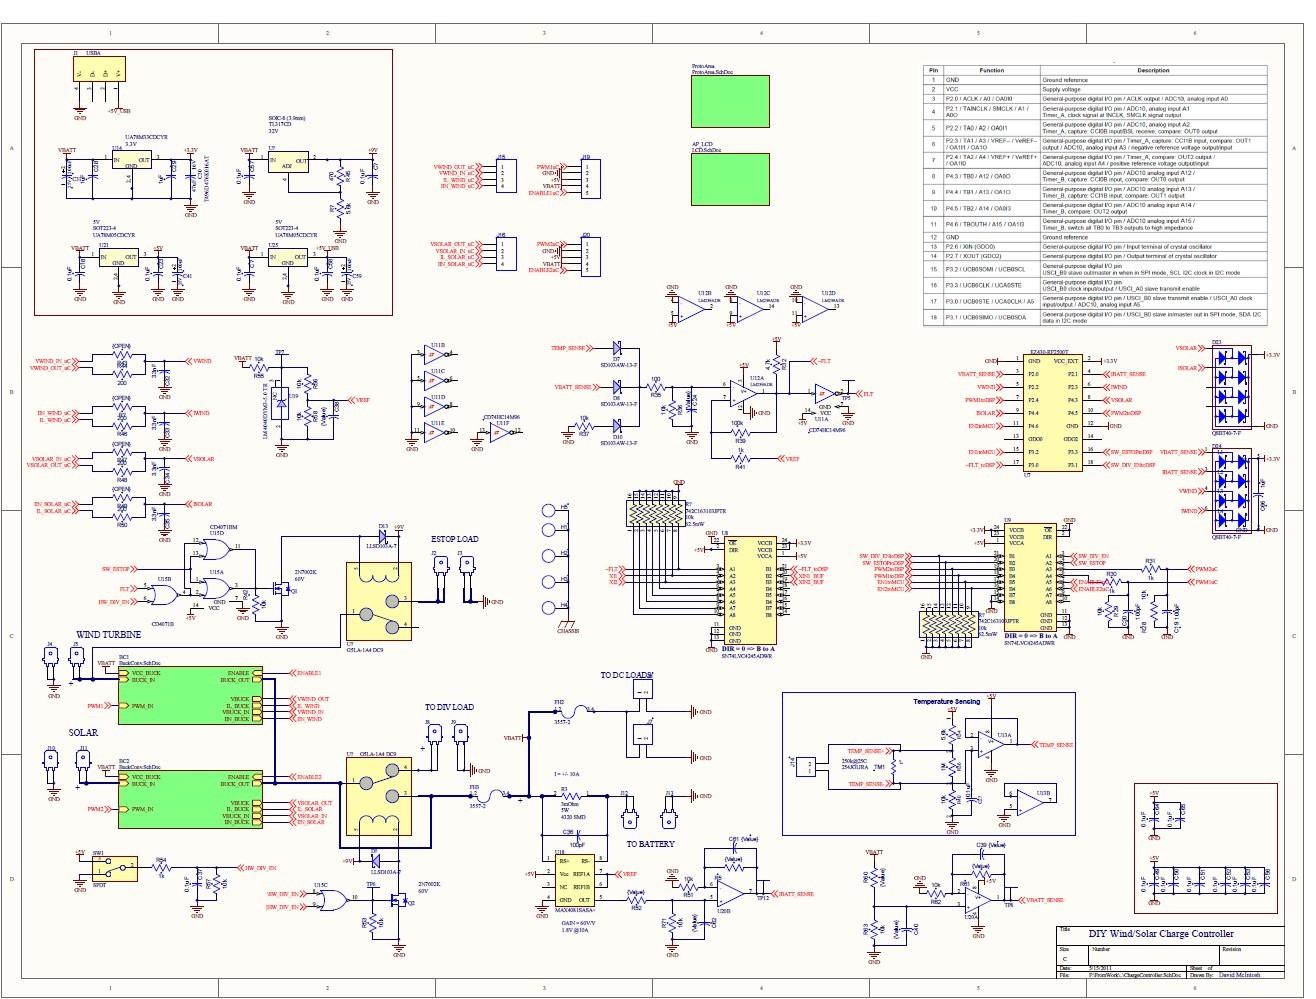 Diy Wind Turbine Wiring Trusted Diagrams Diagram Schematics Schematic Generators